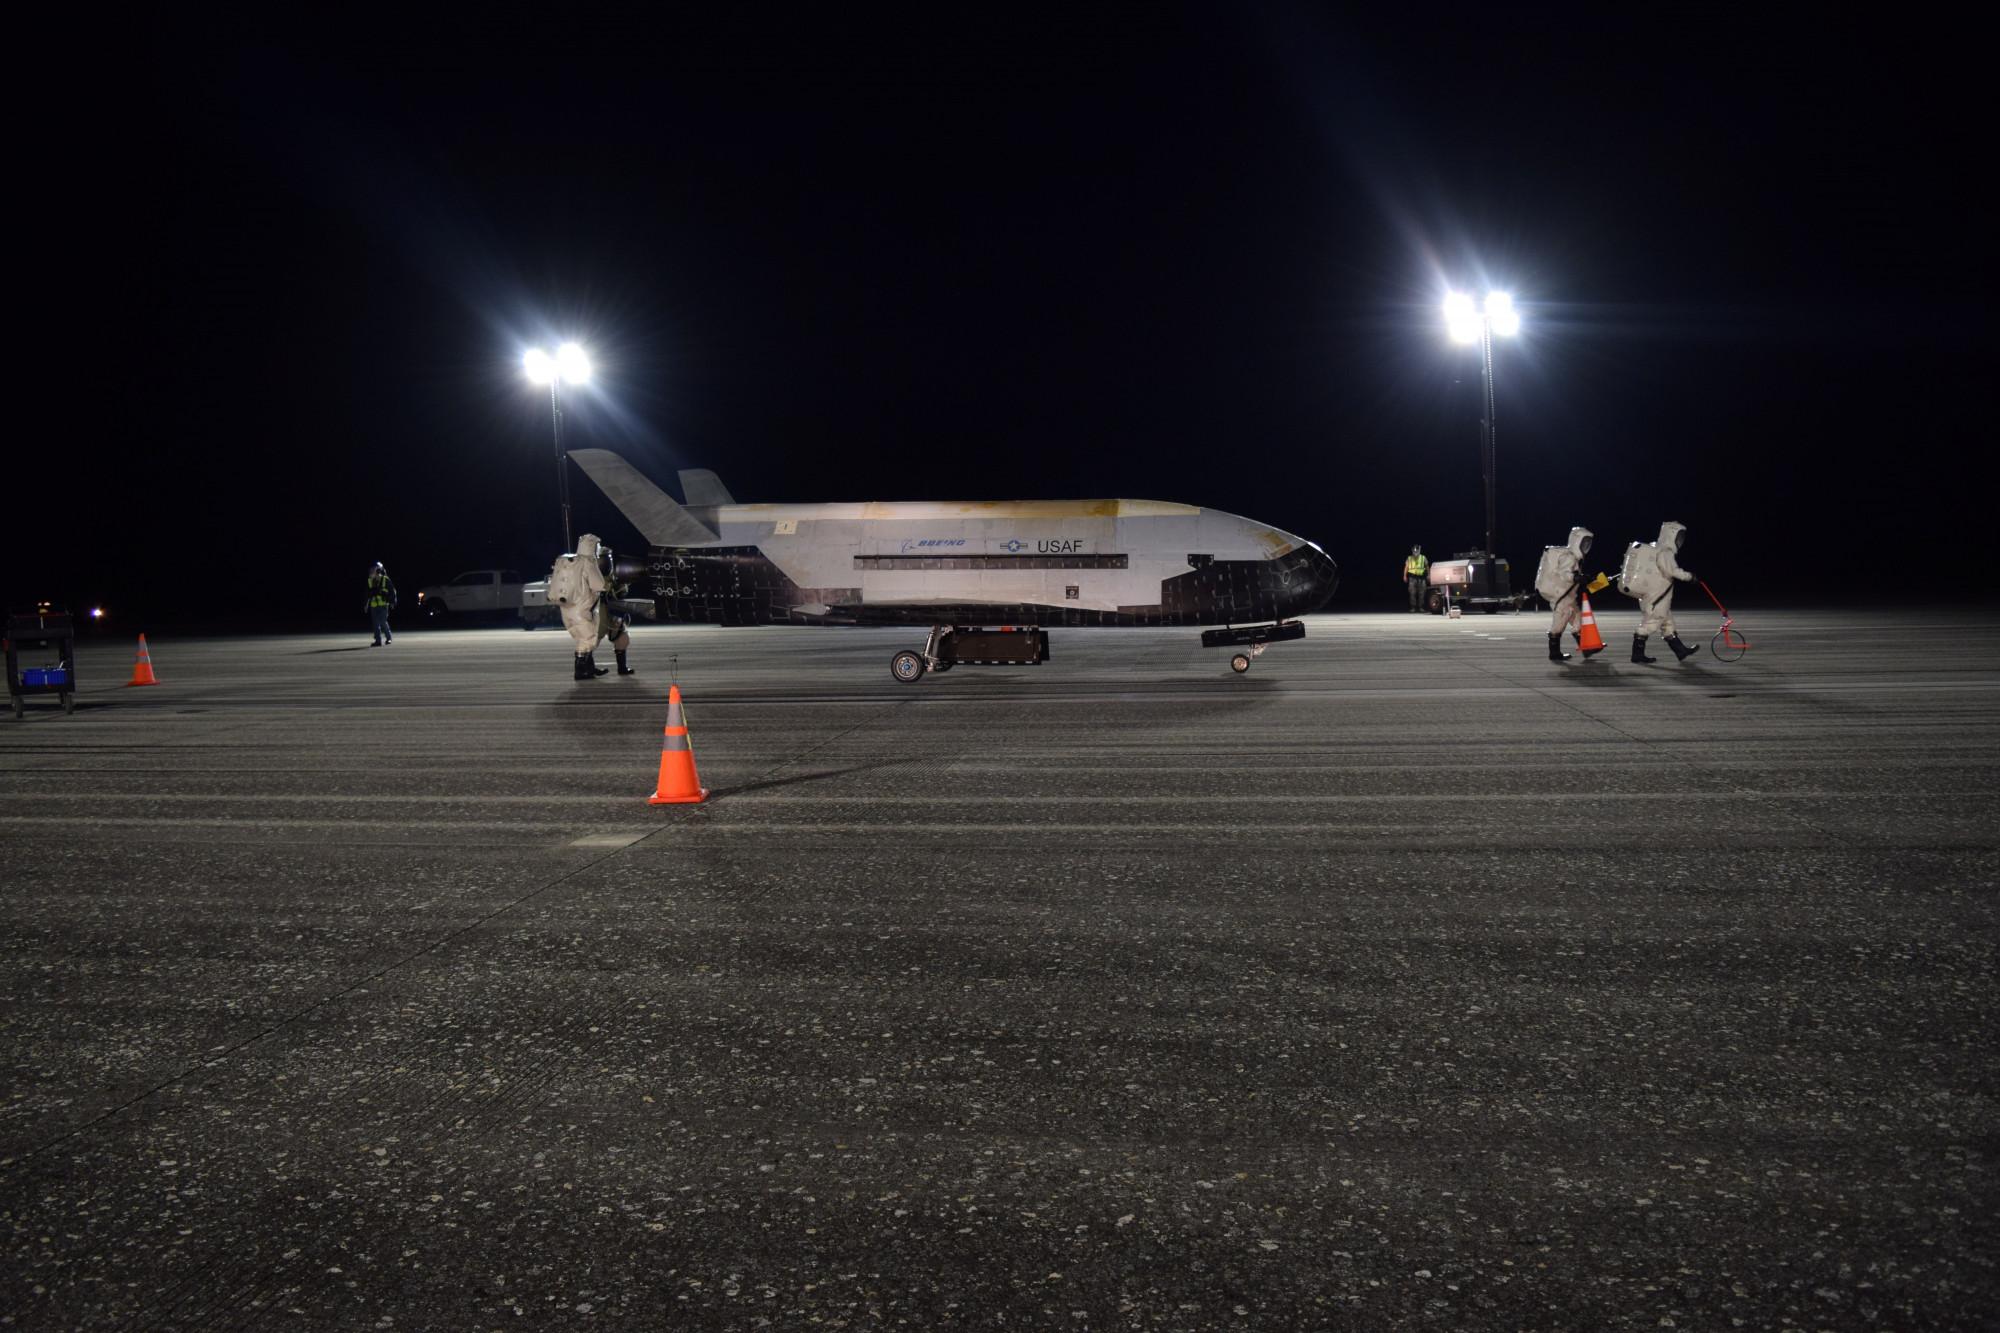 Secretive Military Spaceplane Lands in Florida After Record-Long Orbital Flight